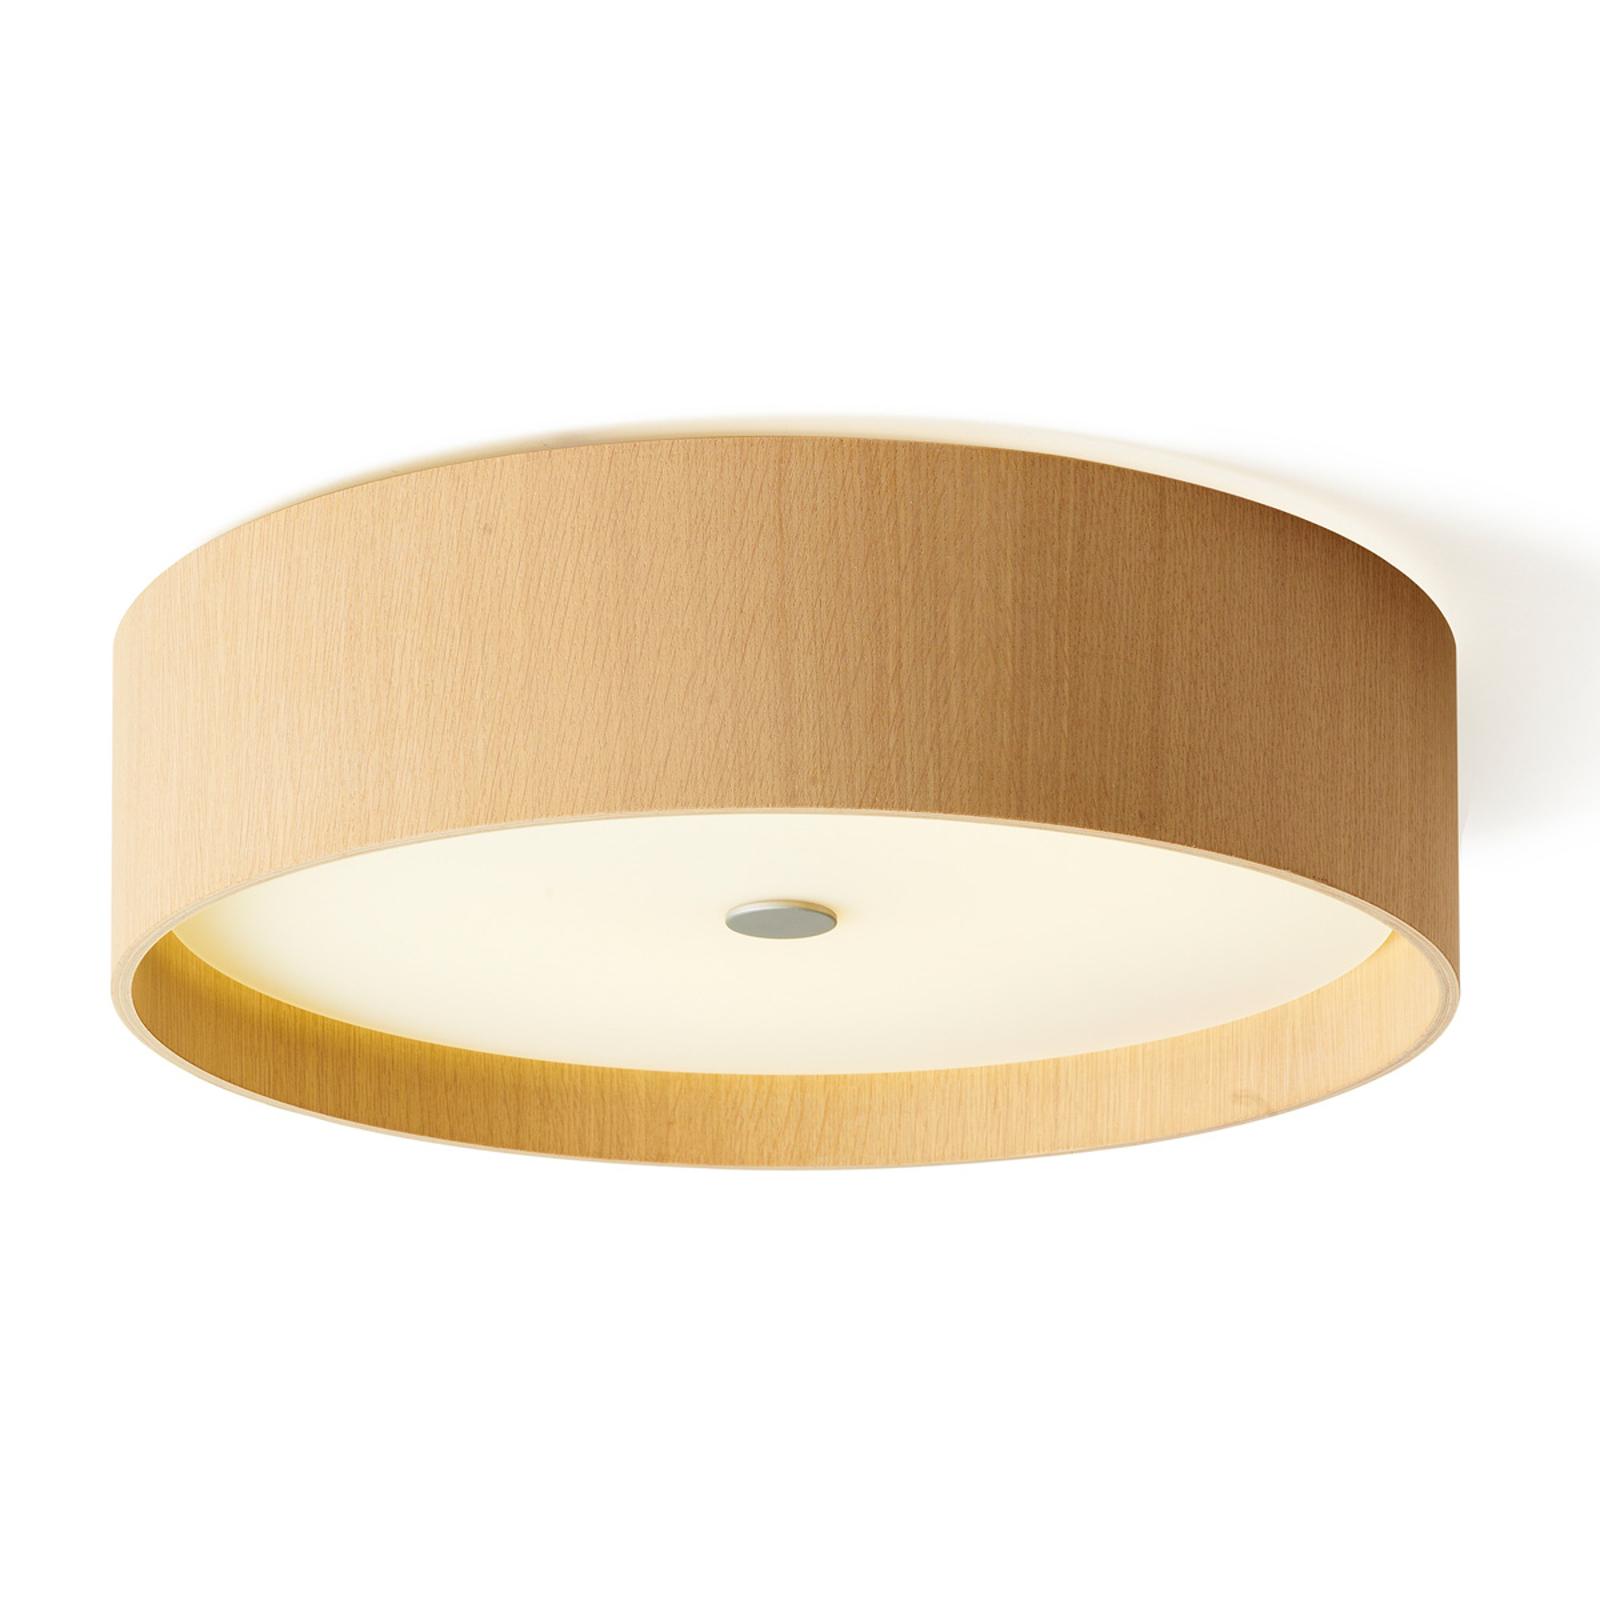 Tretaklampe Lara wood med LED 43 cm